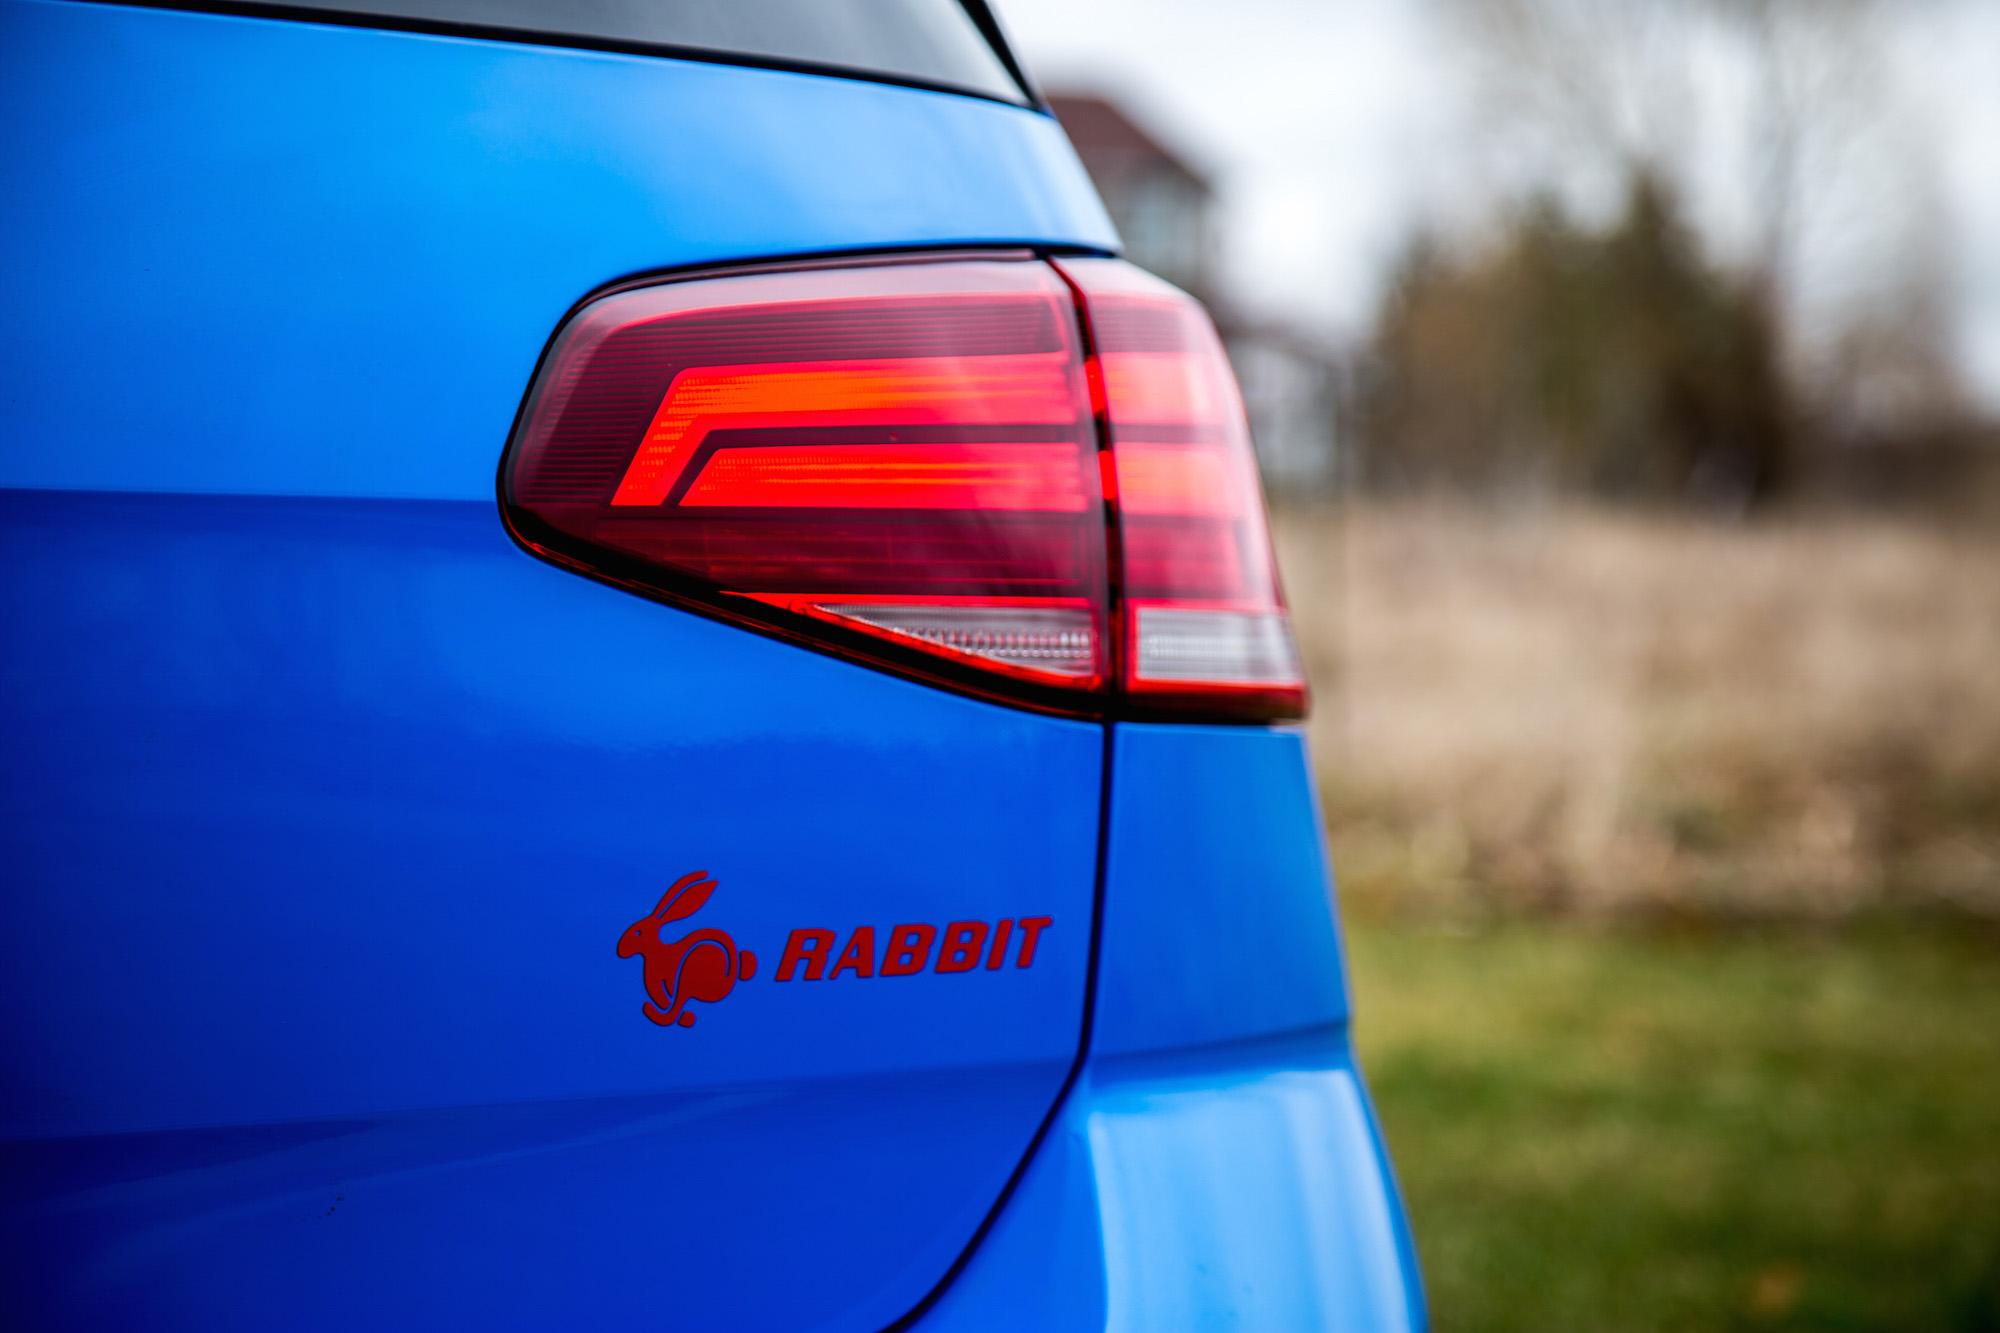 Review: 2019 Volkswagen Golf GTI Rabbit Edition